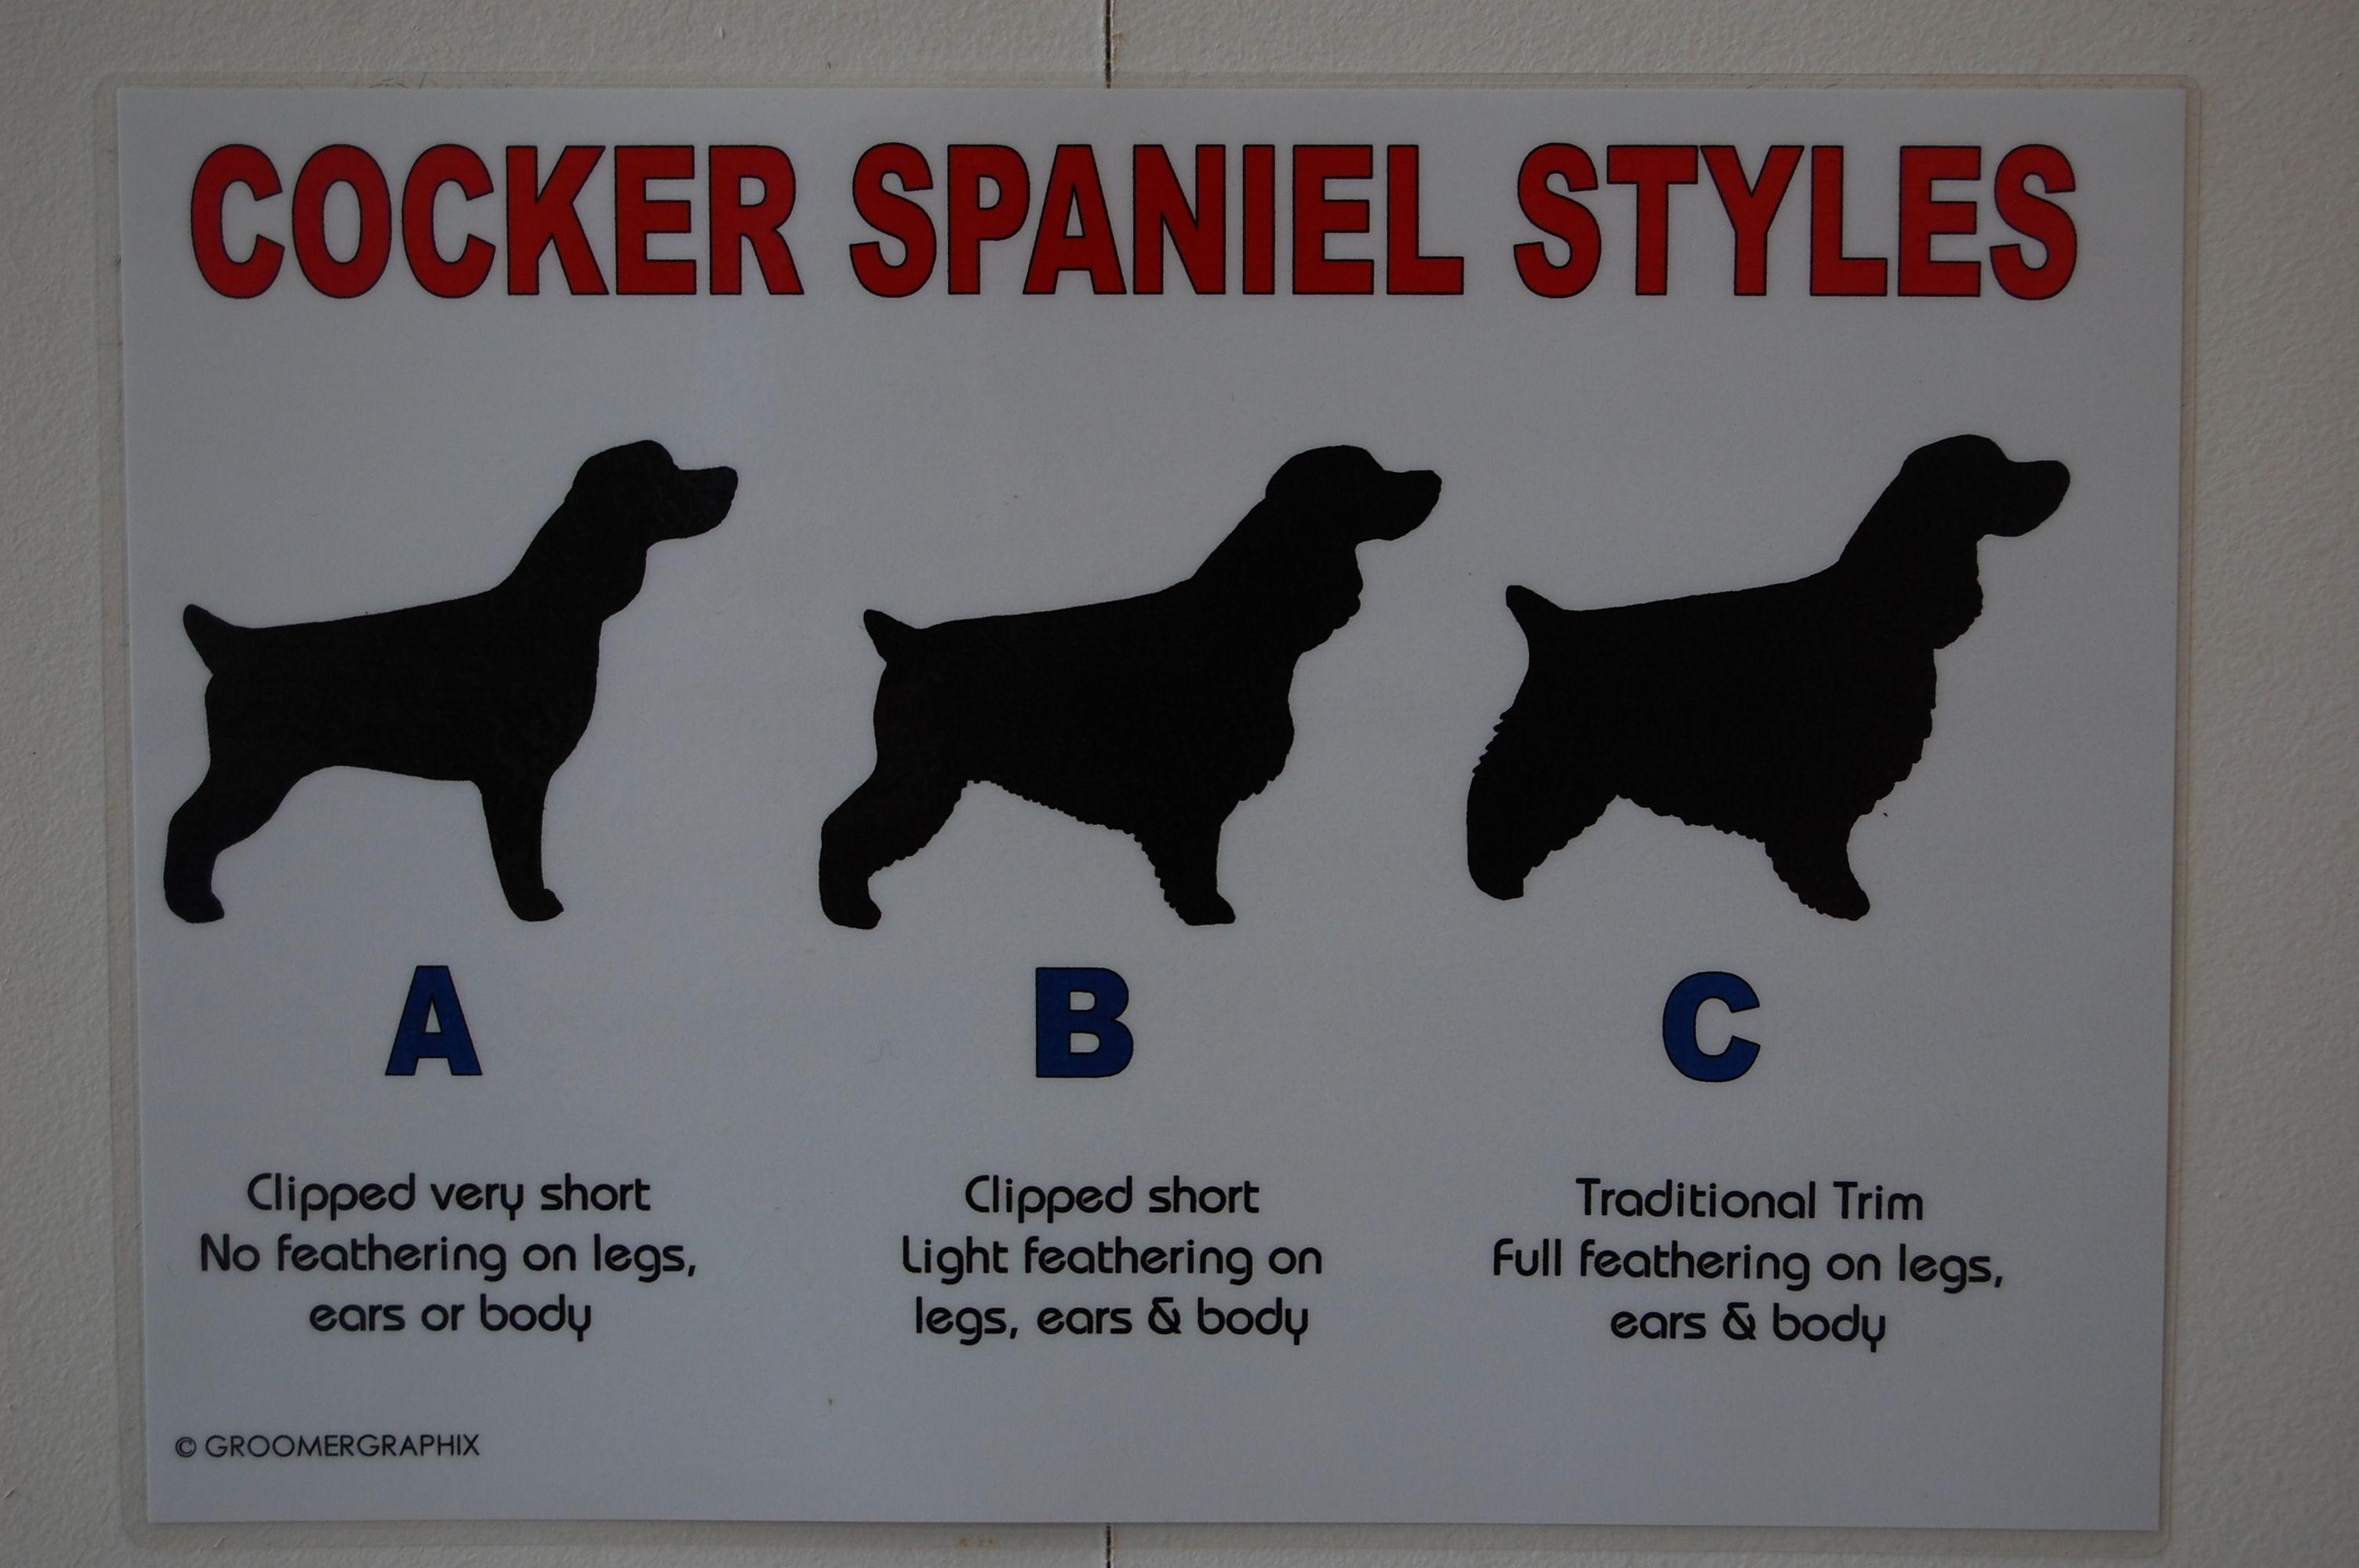 Posh Paws Dog Grooming Salon Cocker Spaniel Grooming Dog Grooming Salons Cleaning Dogs Ears